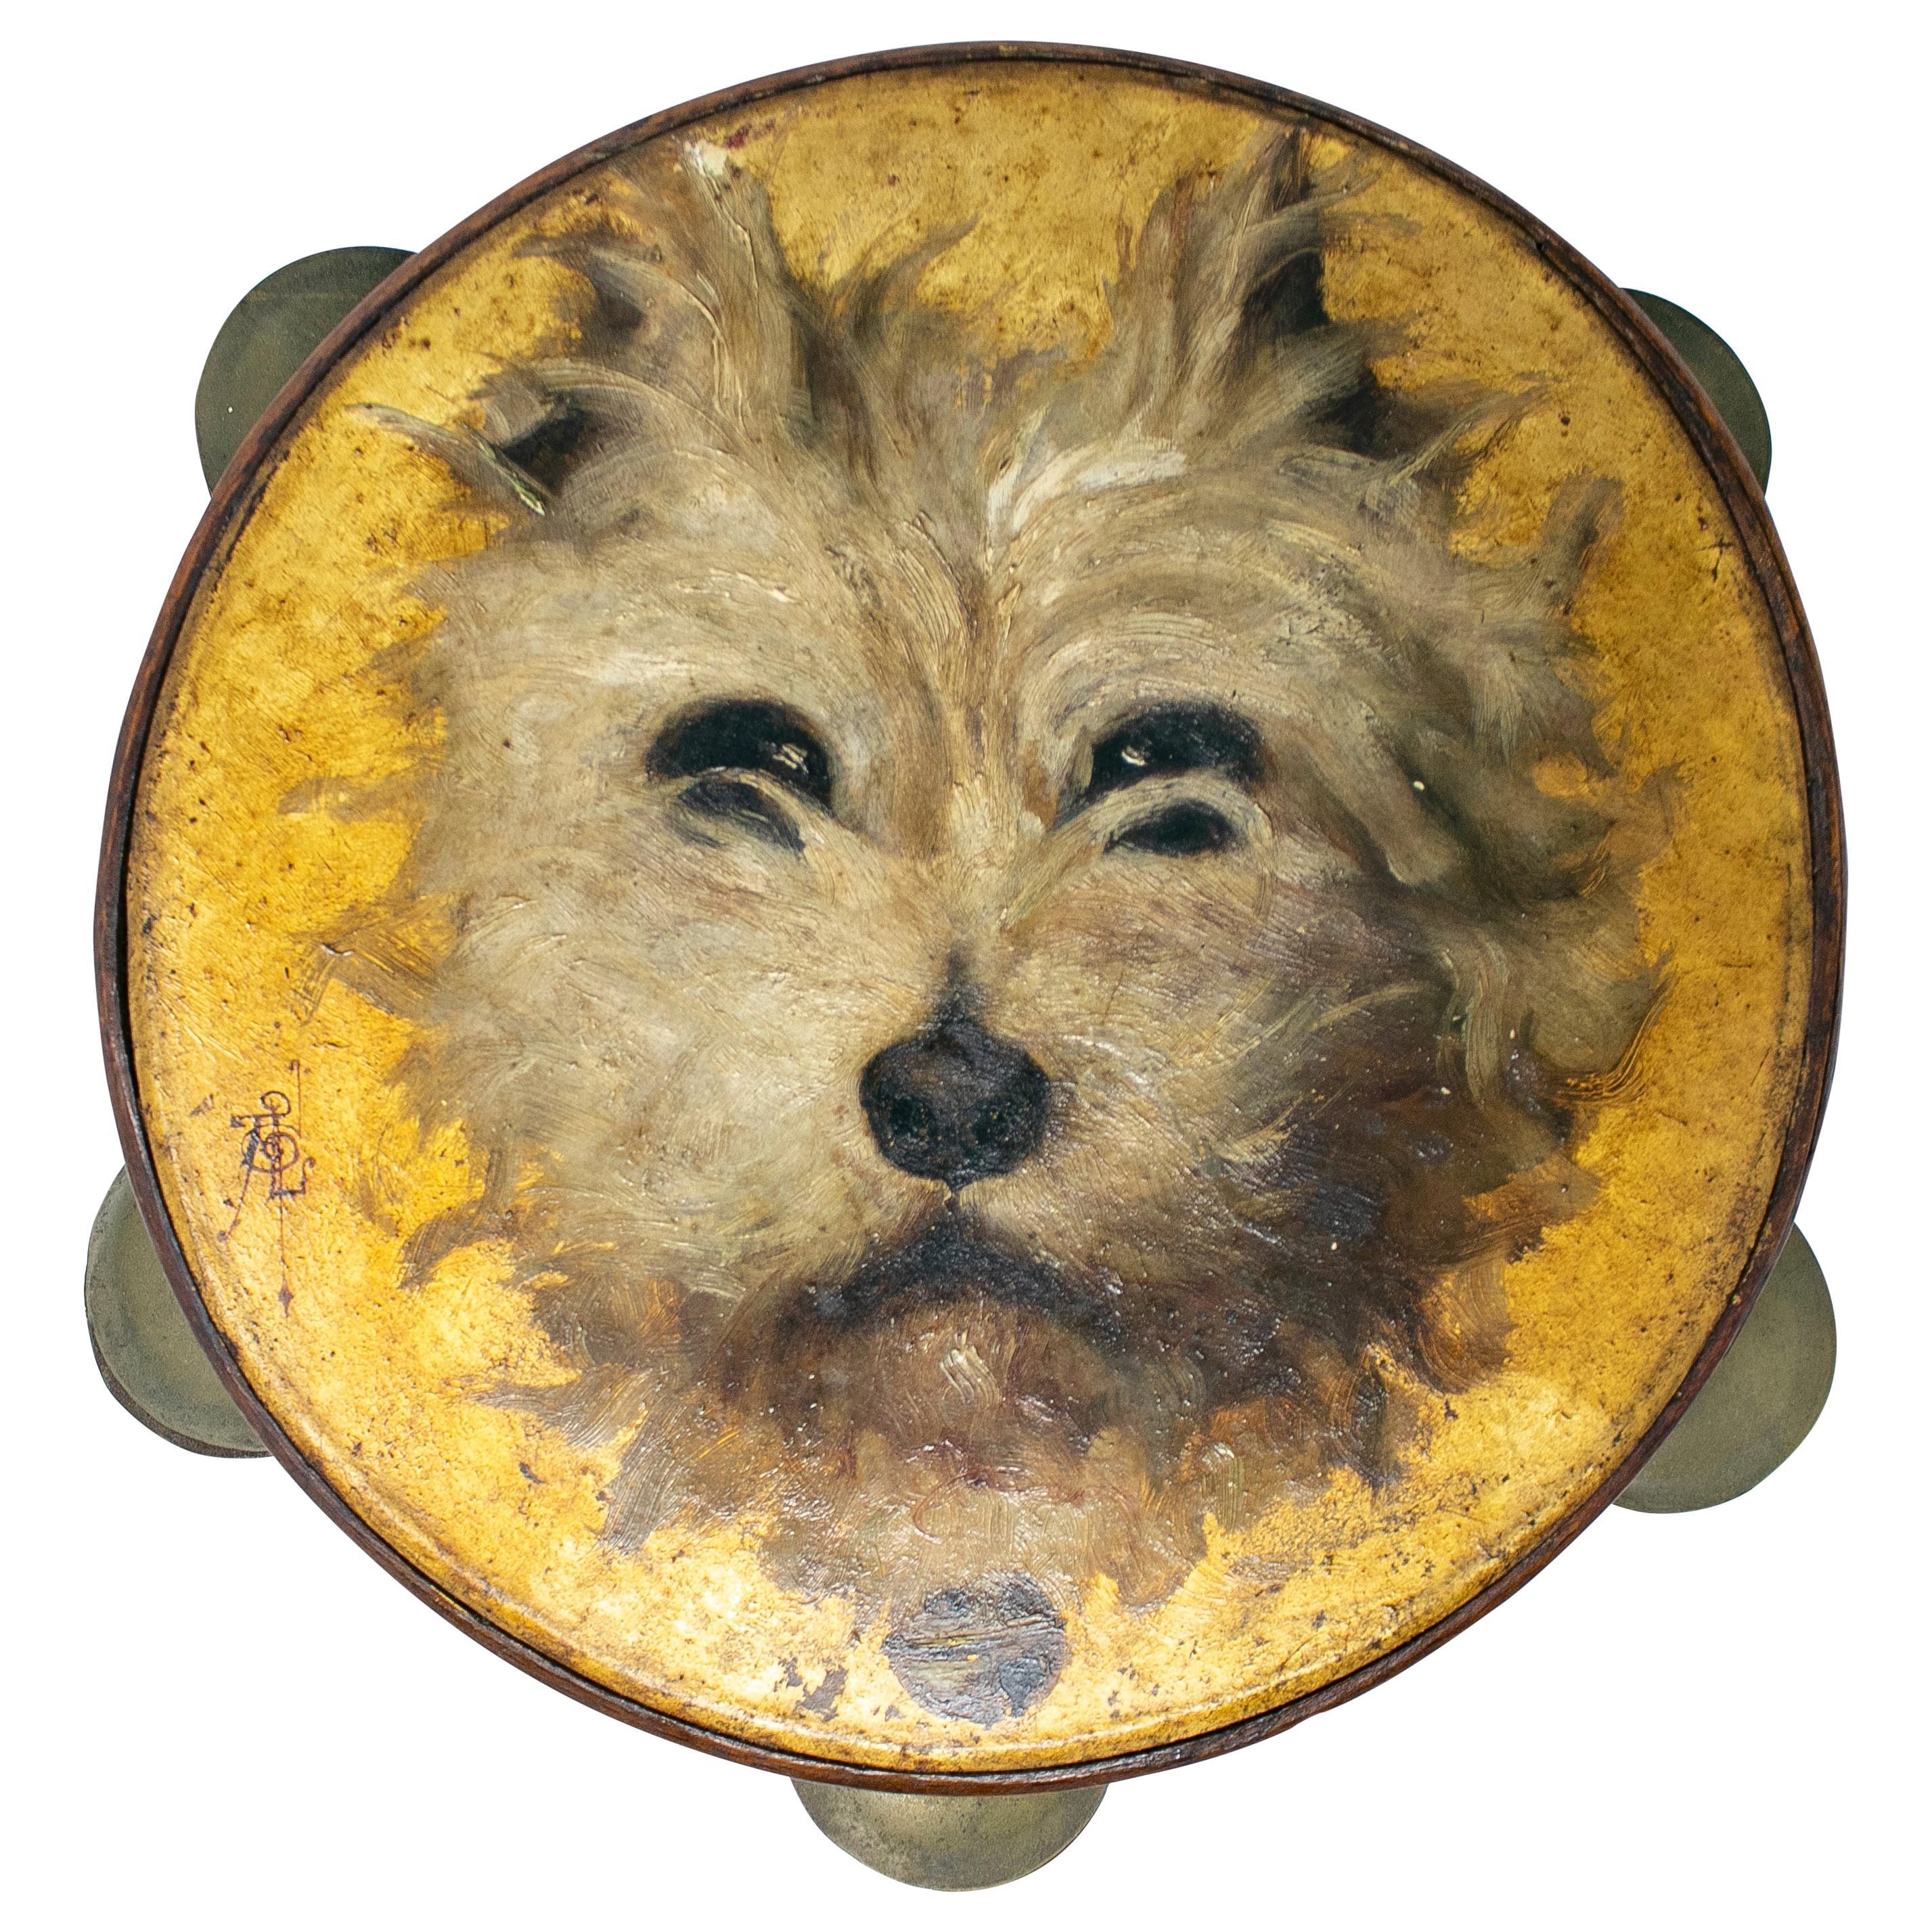 19th Century Spanish Tambourine with Hand Painted Dog Face